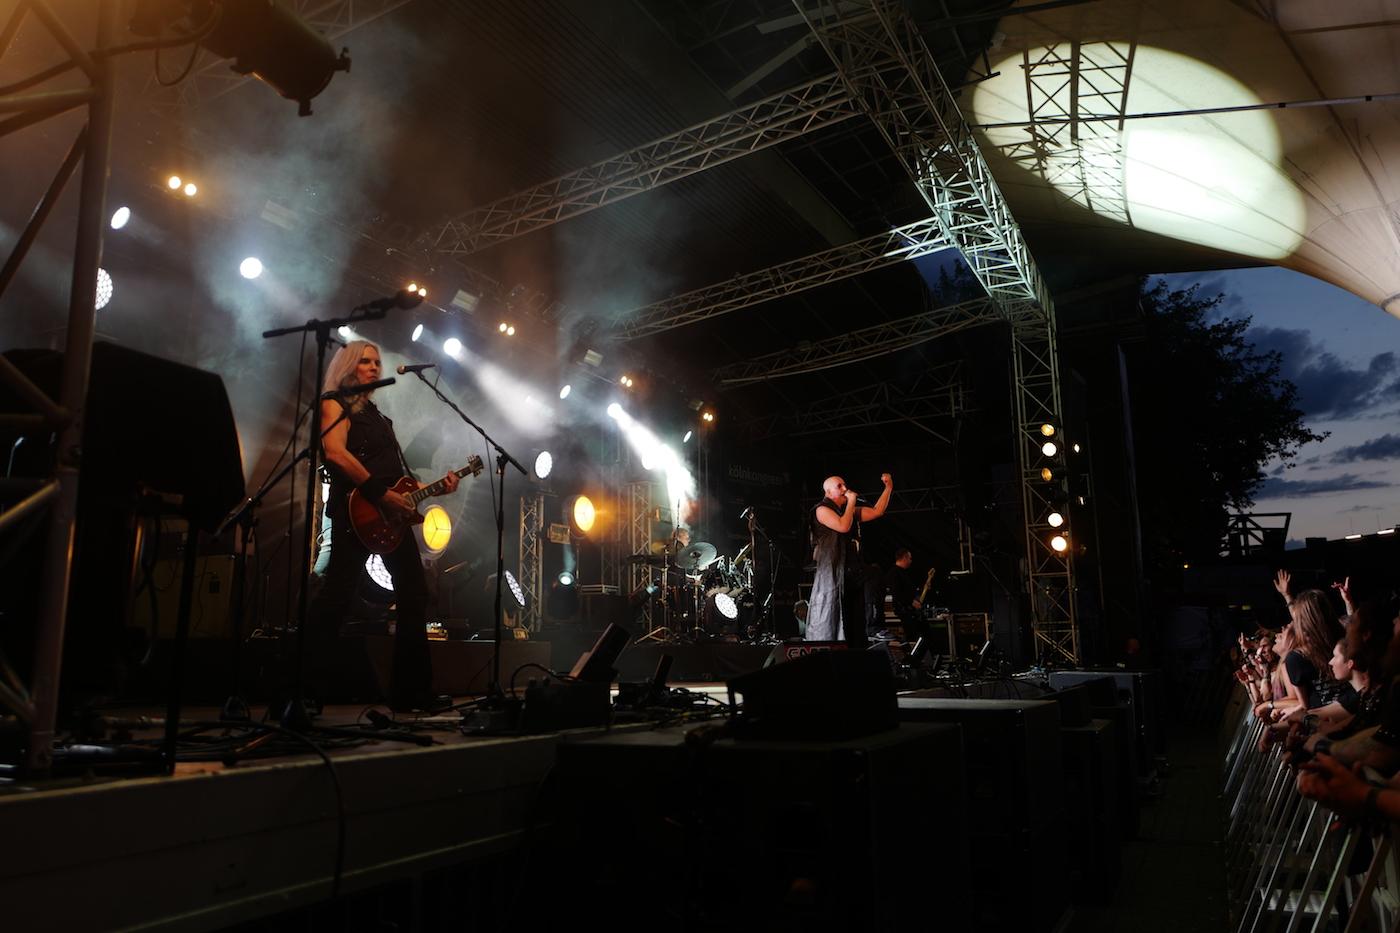 mark_benecke_amphi_festival_koeln_cologne_tanzbrunnen_gothic_OMD_oomph_agonoize_mono_inc_es23_sitd_solar_fake - 85.jpg